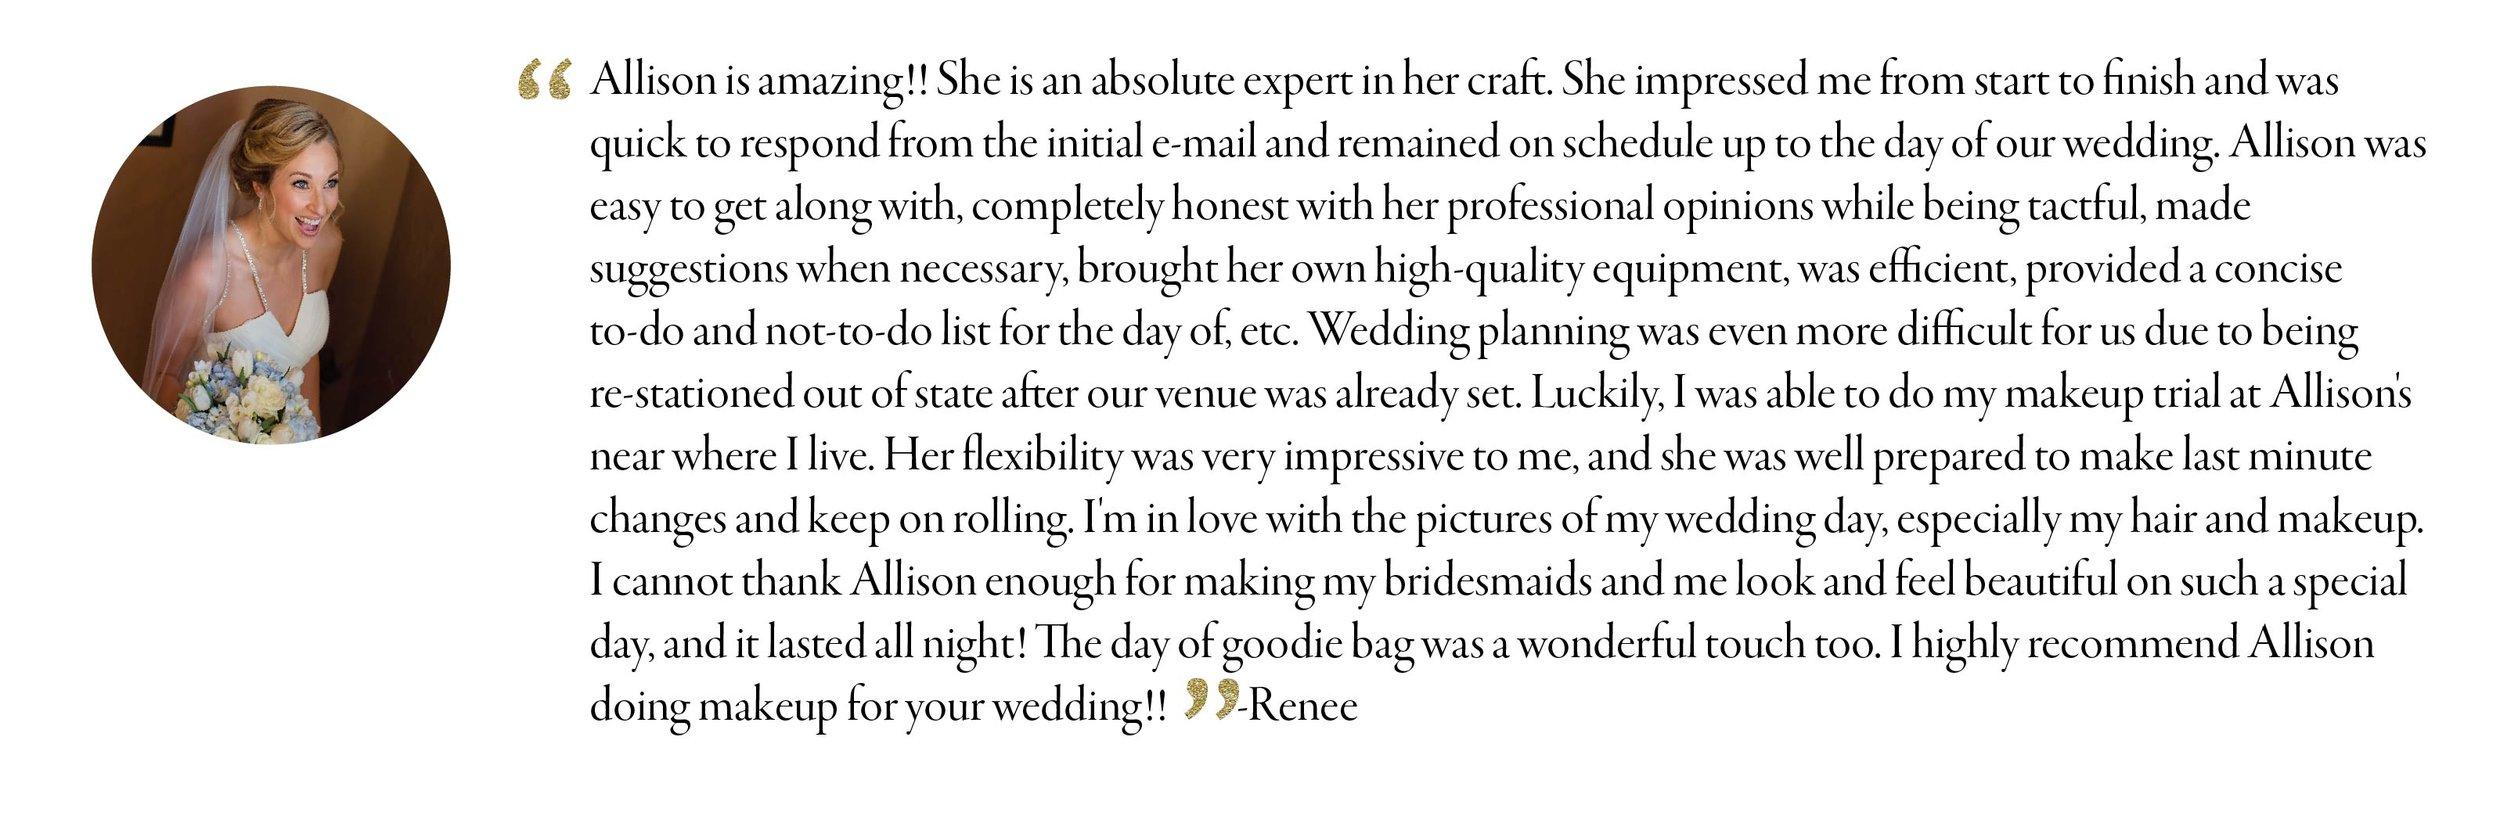 Wedding Wire Testimonial from Renee-01.jpg